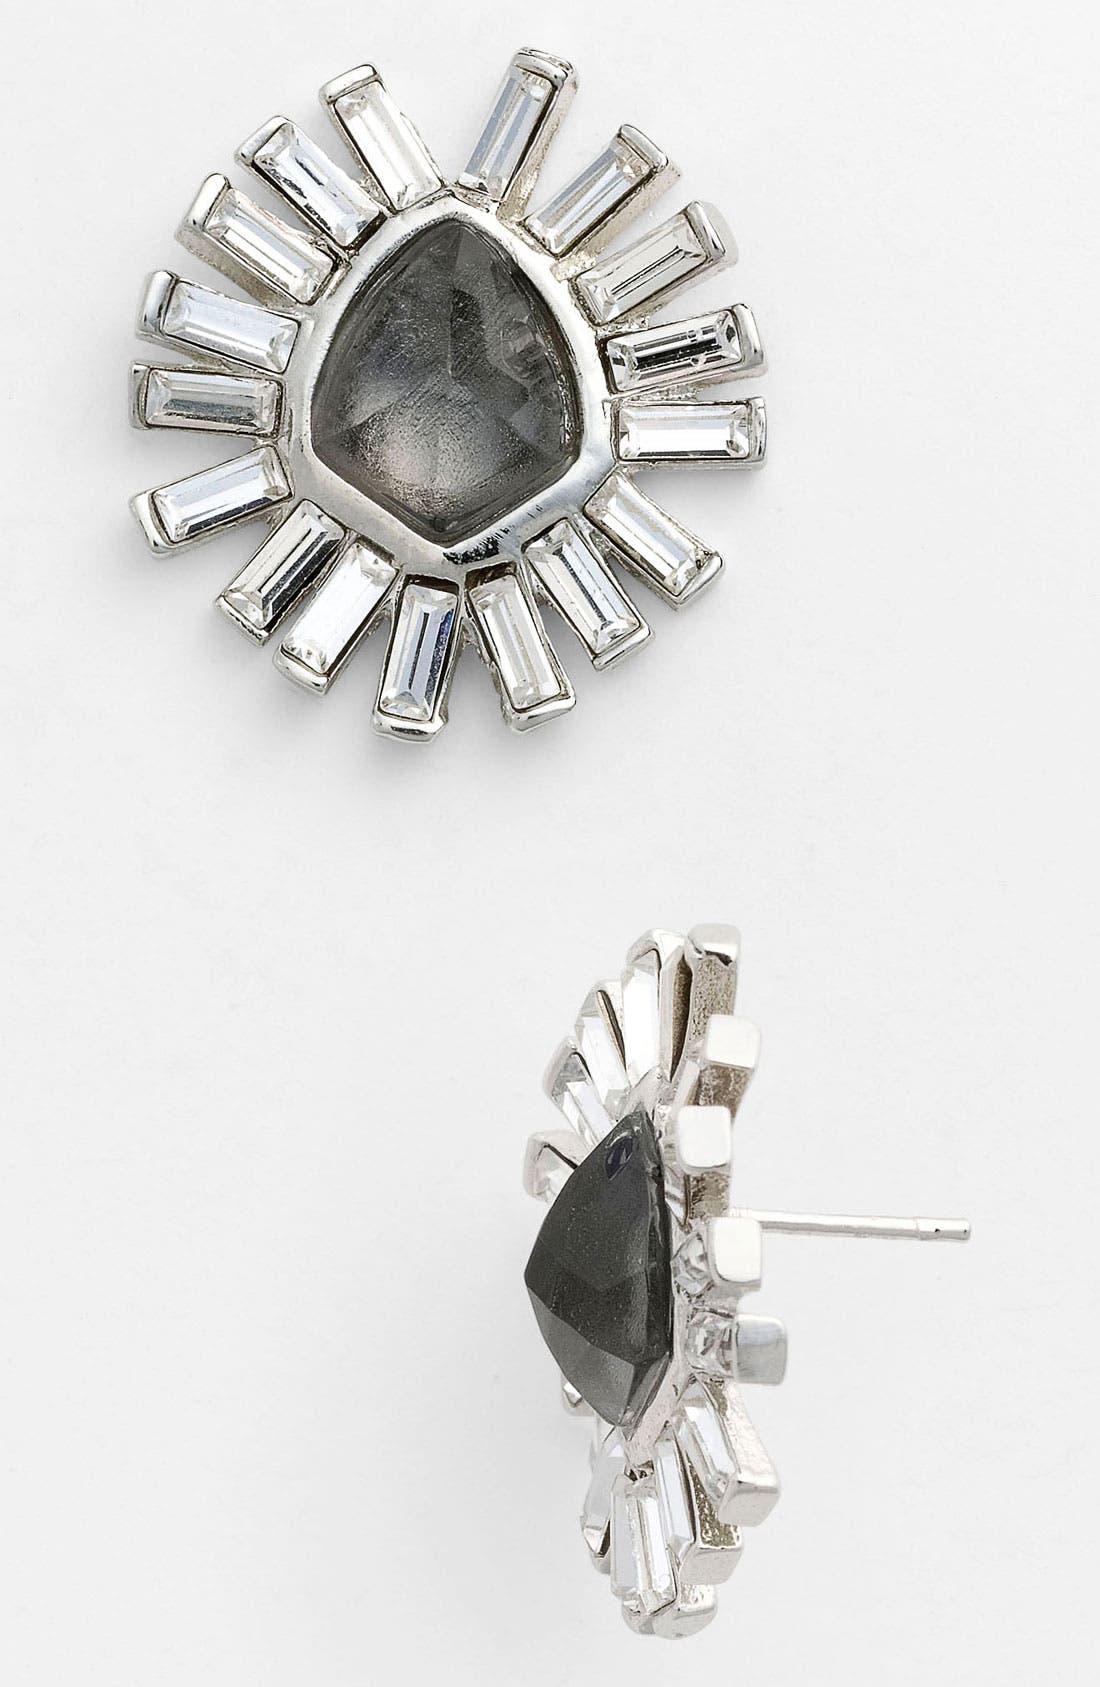 Alternate Image 1 Selected - Alexis Bittar 'Miss Havisham - Bel Air' Starburst Stud Earrings